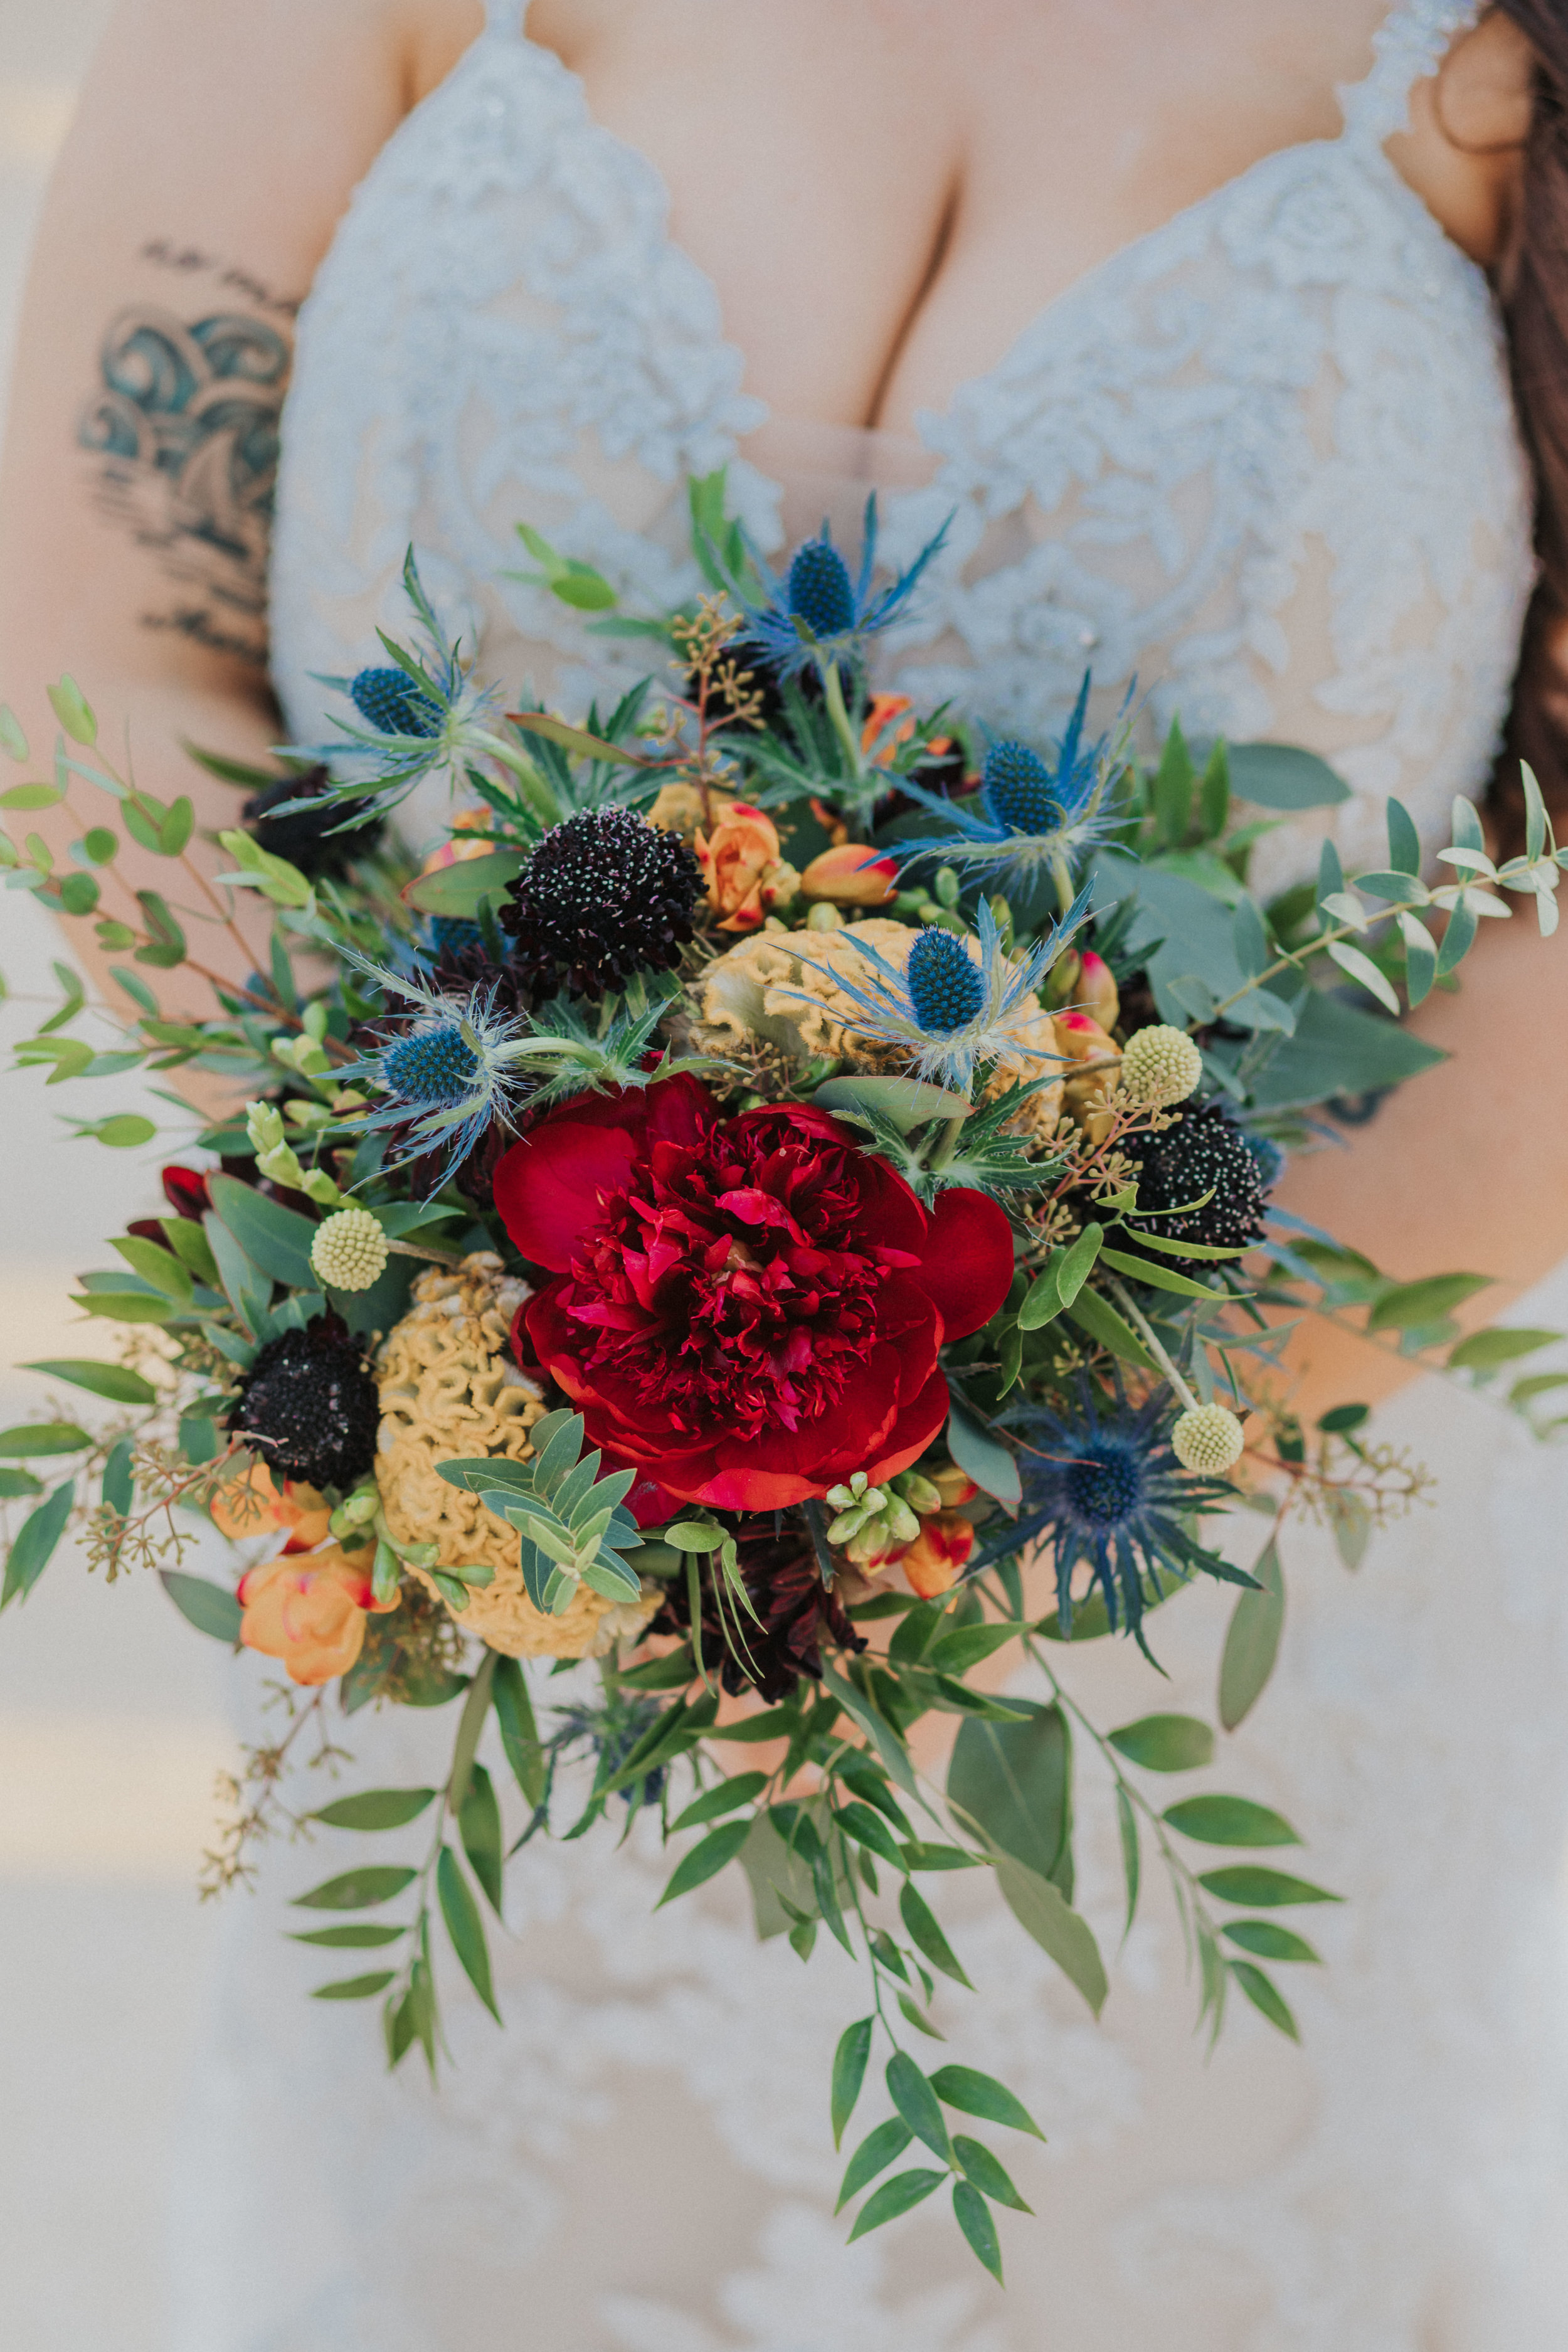 44omaha-old-market-intimate-summer-wedding-tiny-luxe-elopement.jpg